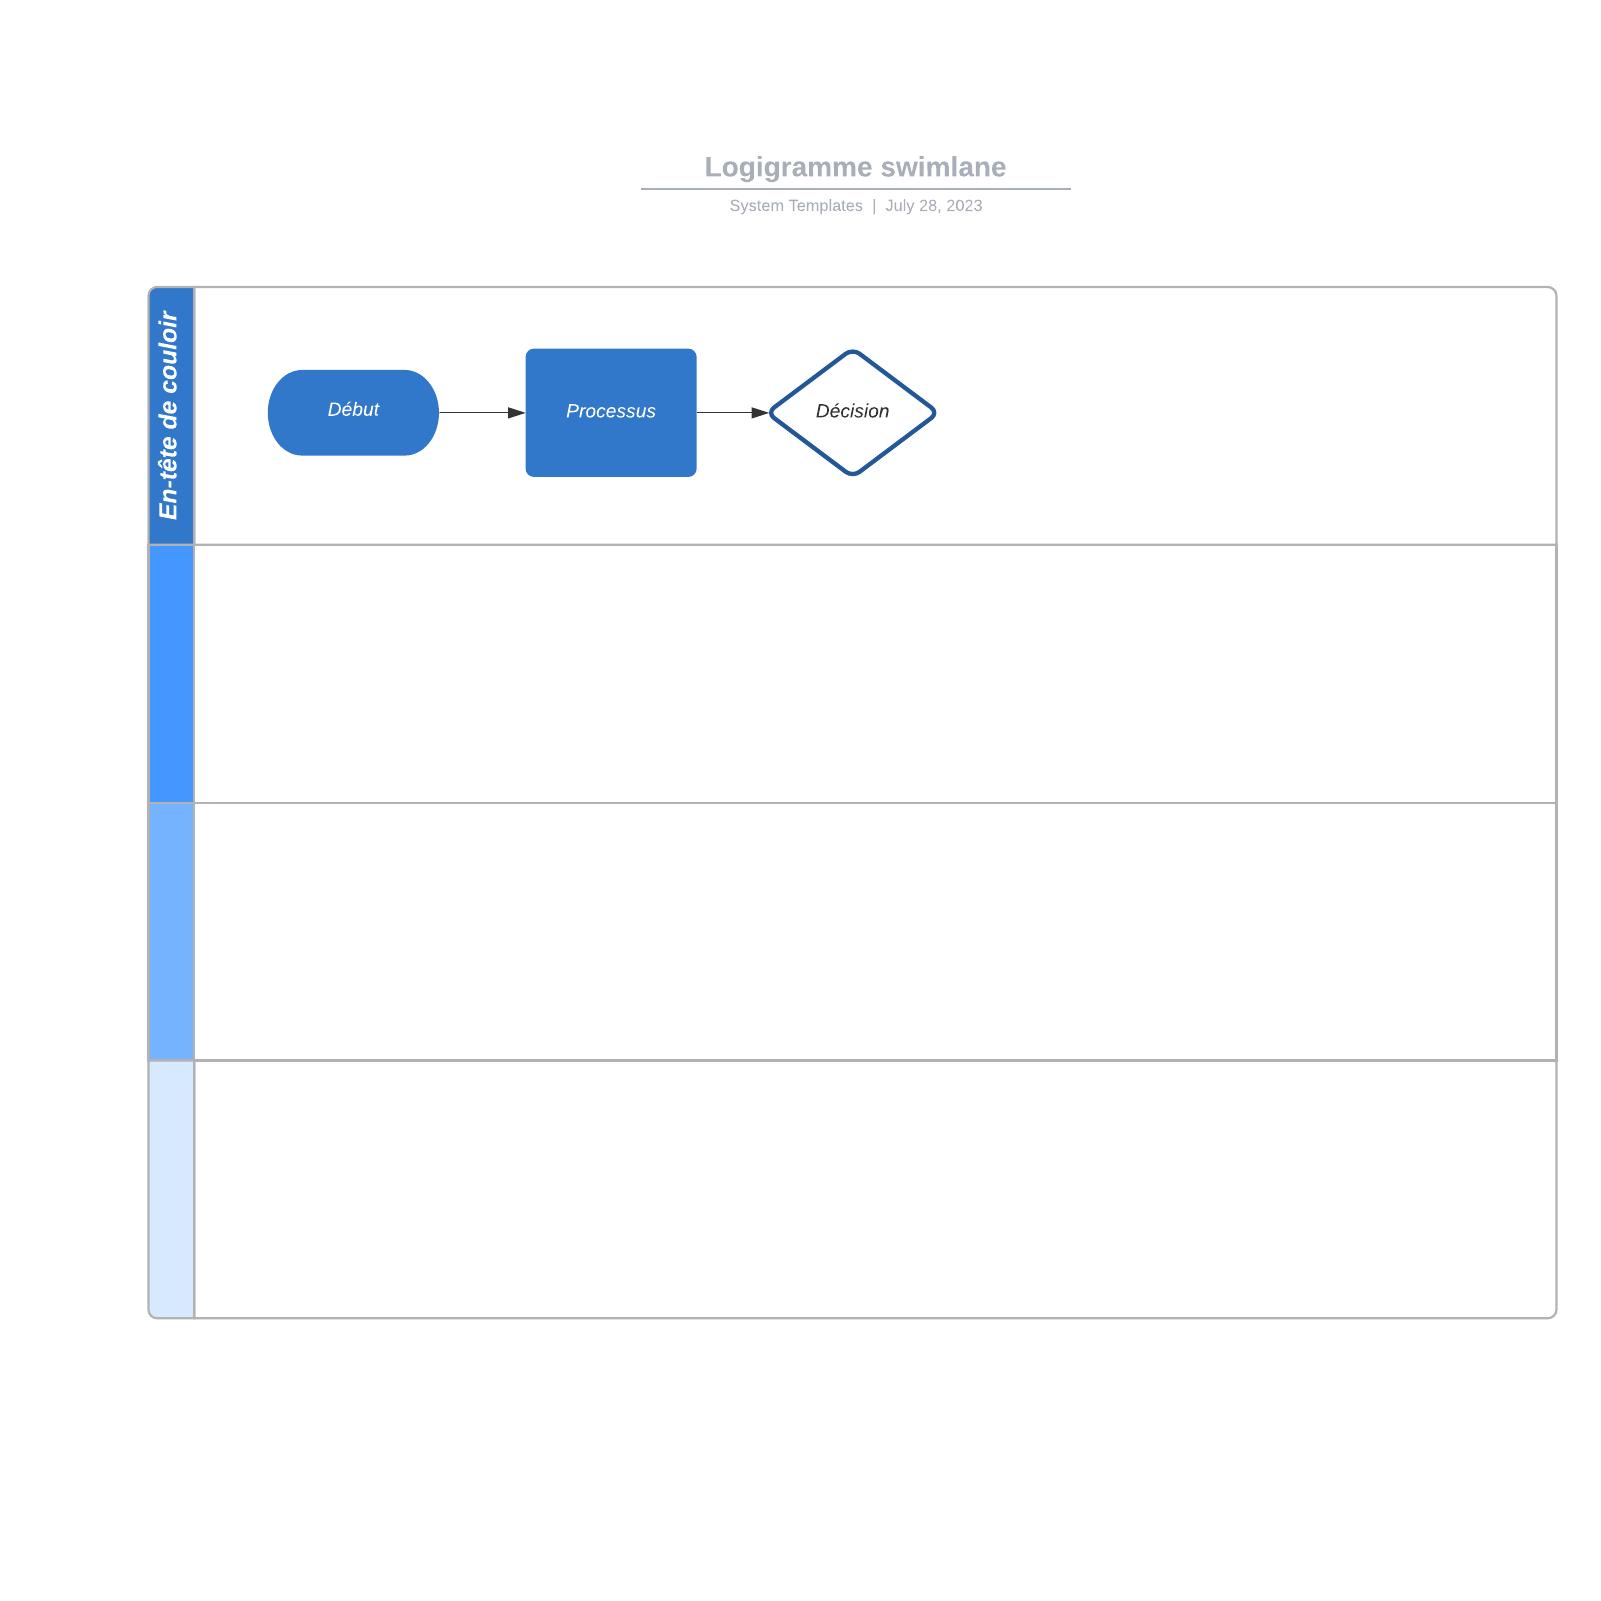 exemple de diagramme swimlane vierge